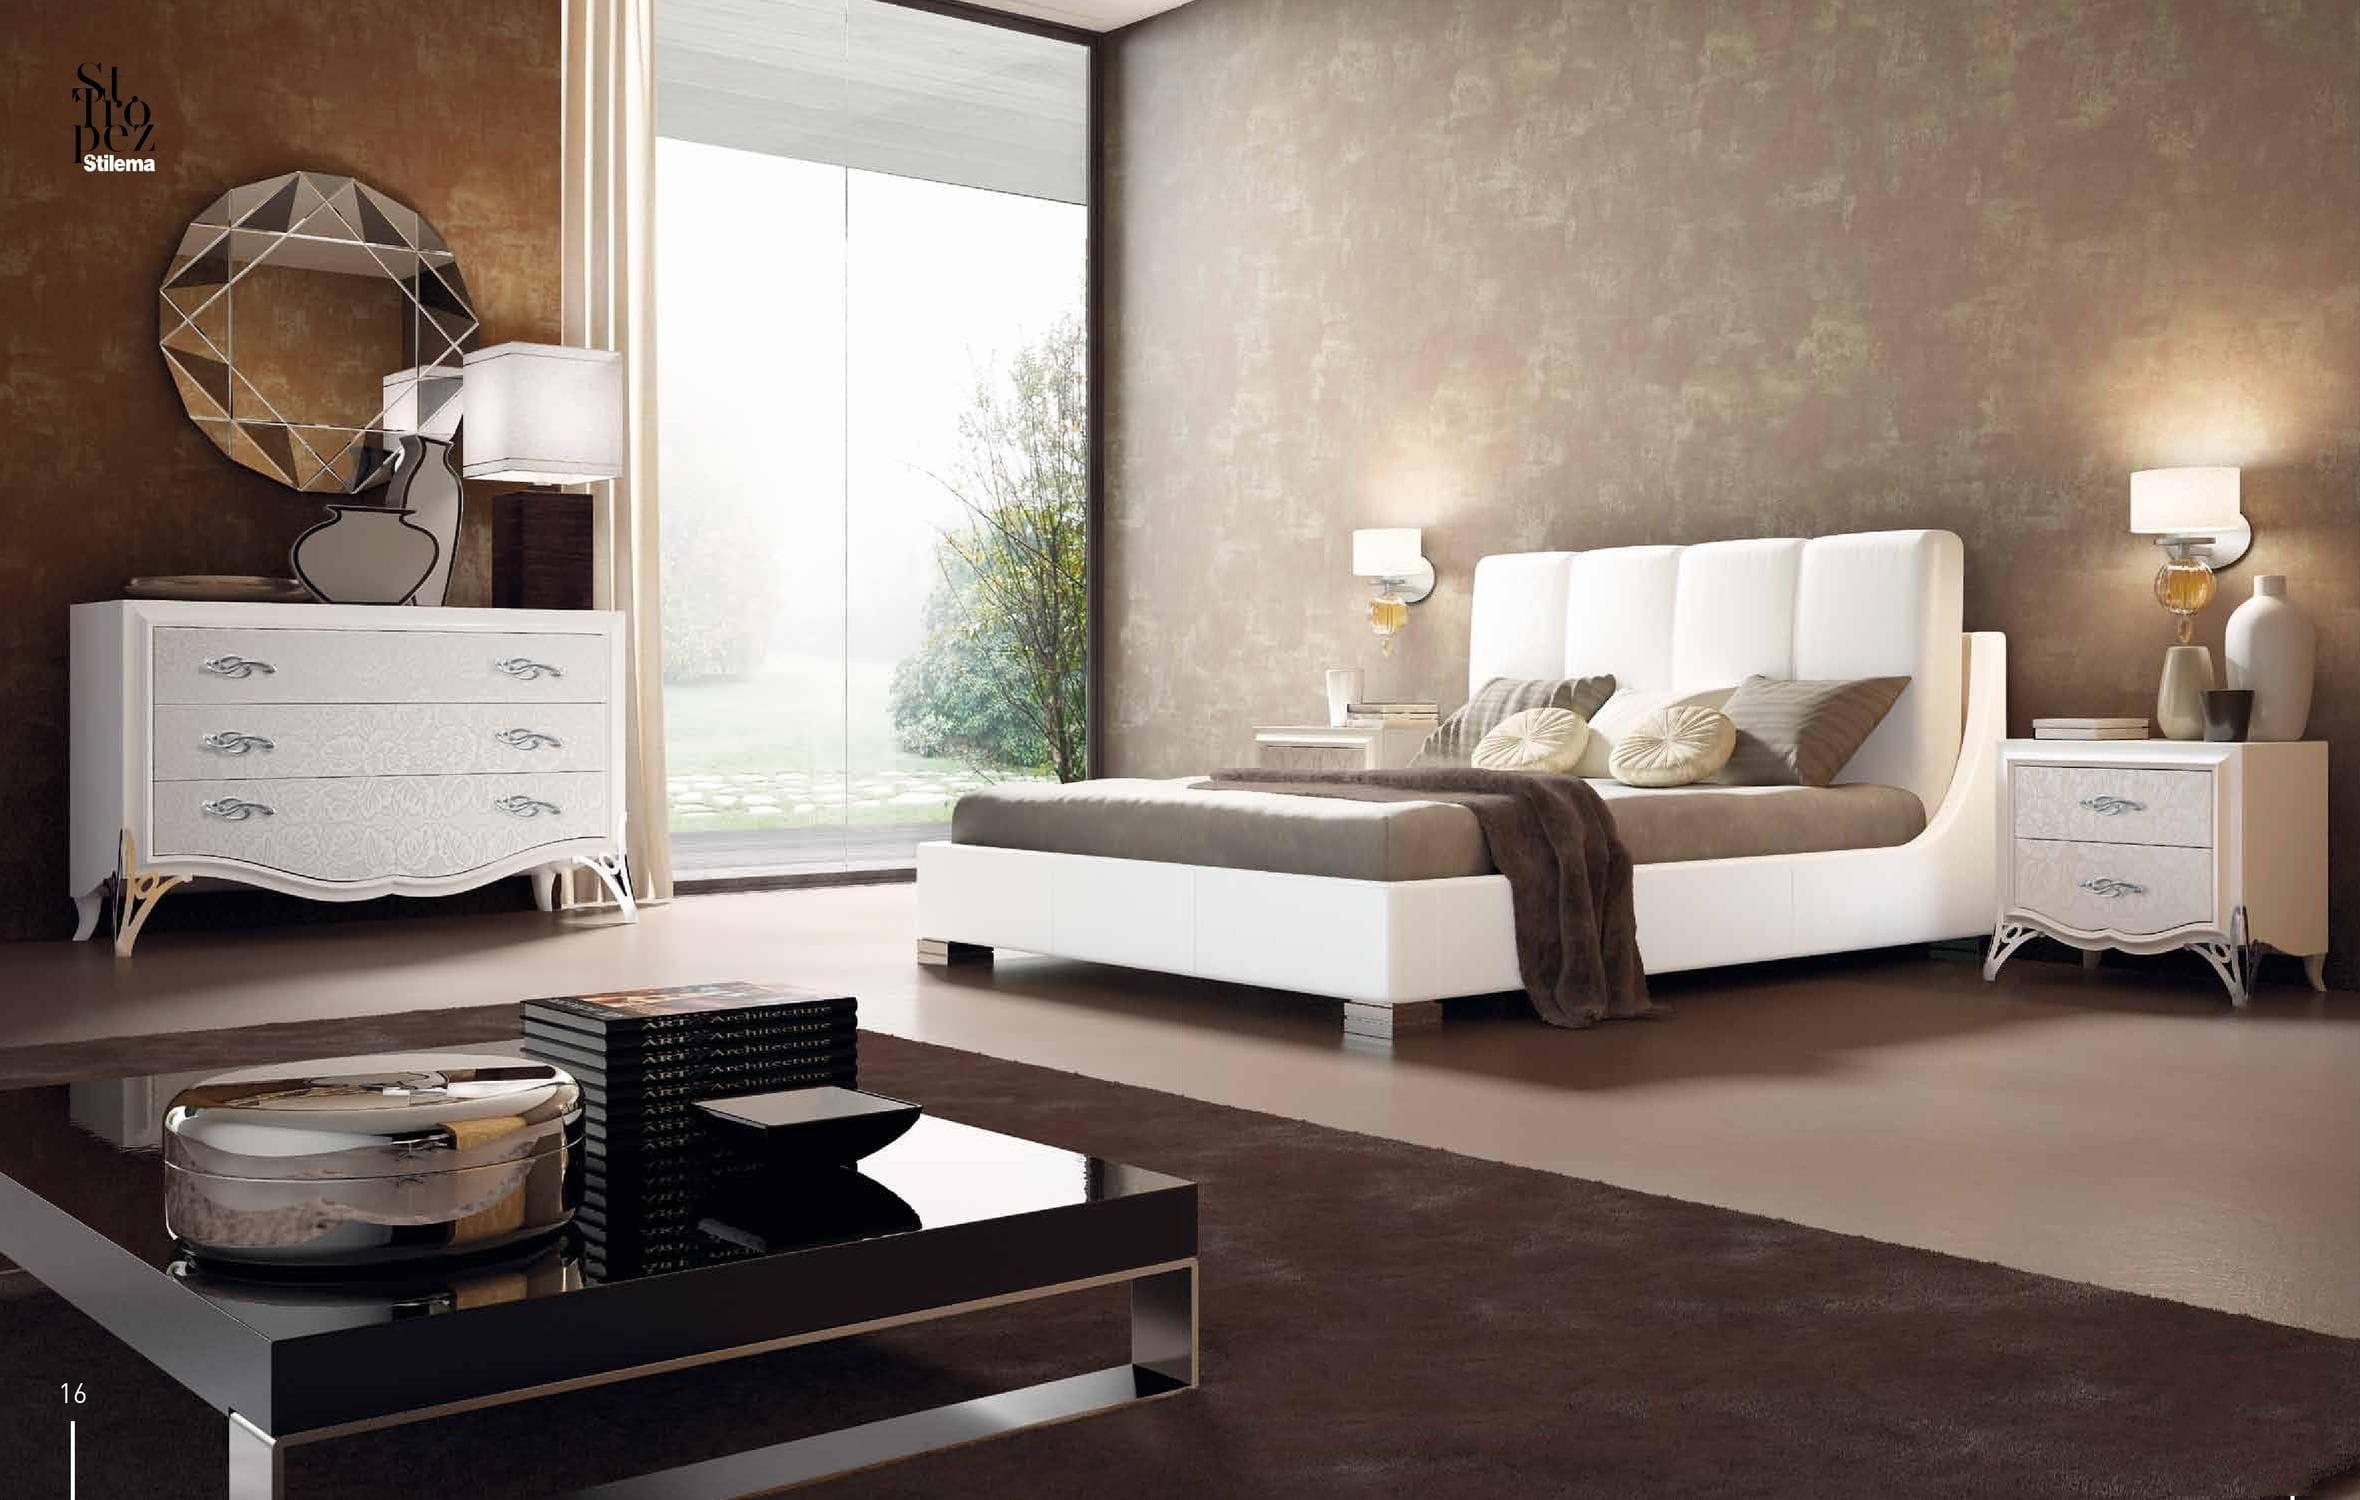 tiarch.com | camera da letto pittura - Camera Da Letto Bianca E Tortora